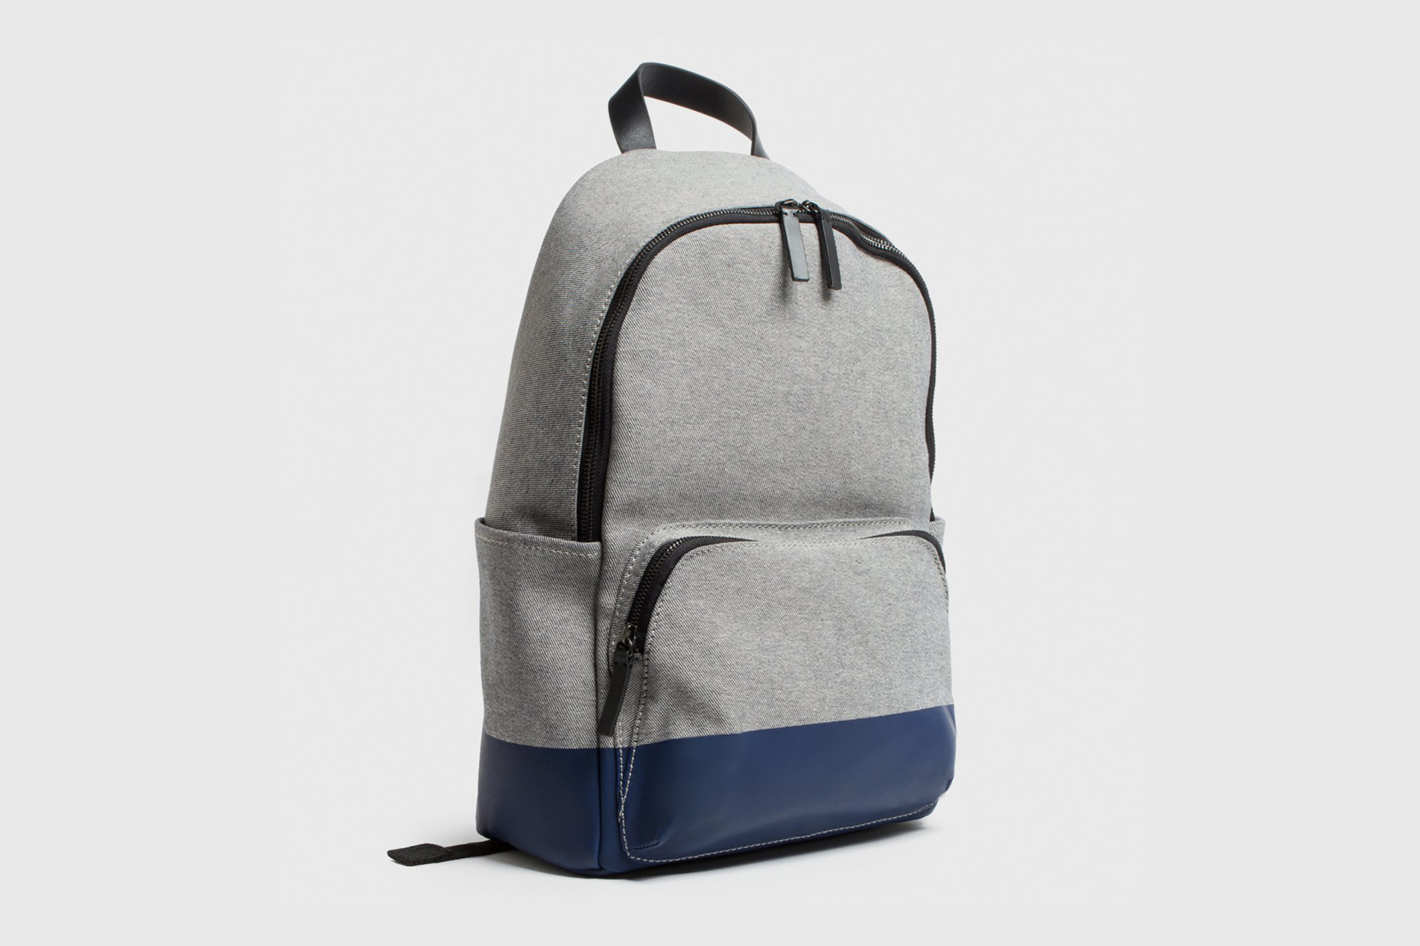 The Modern Zip Backpack